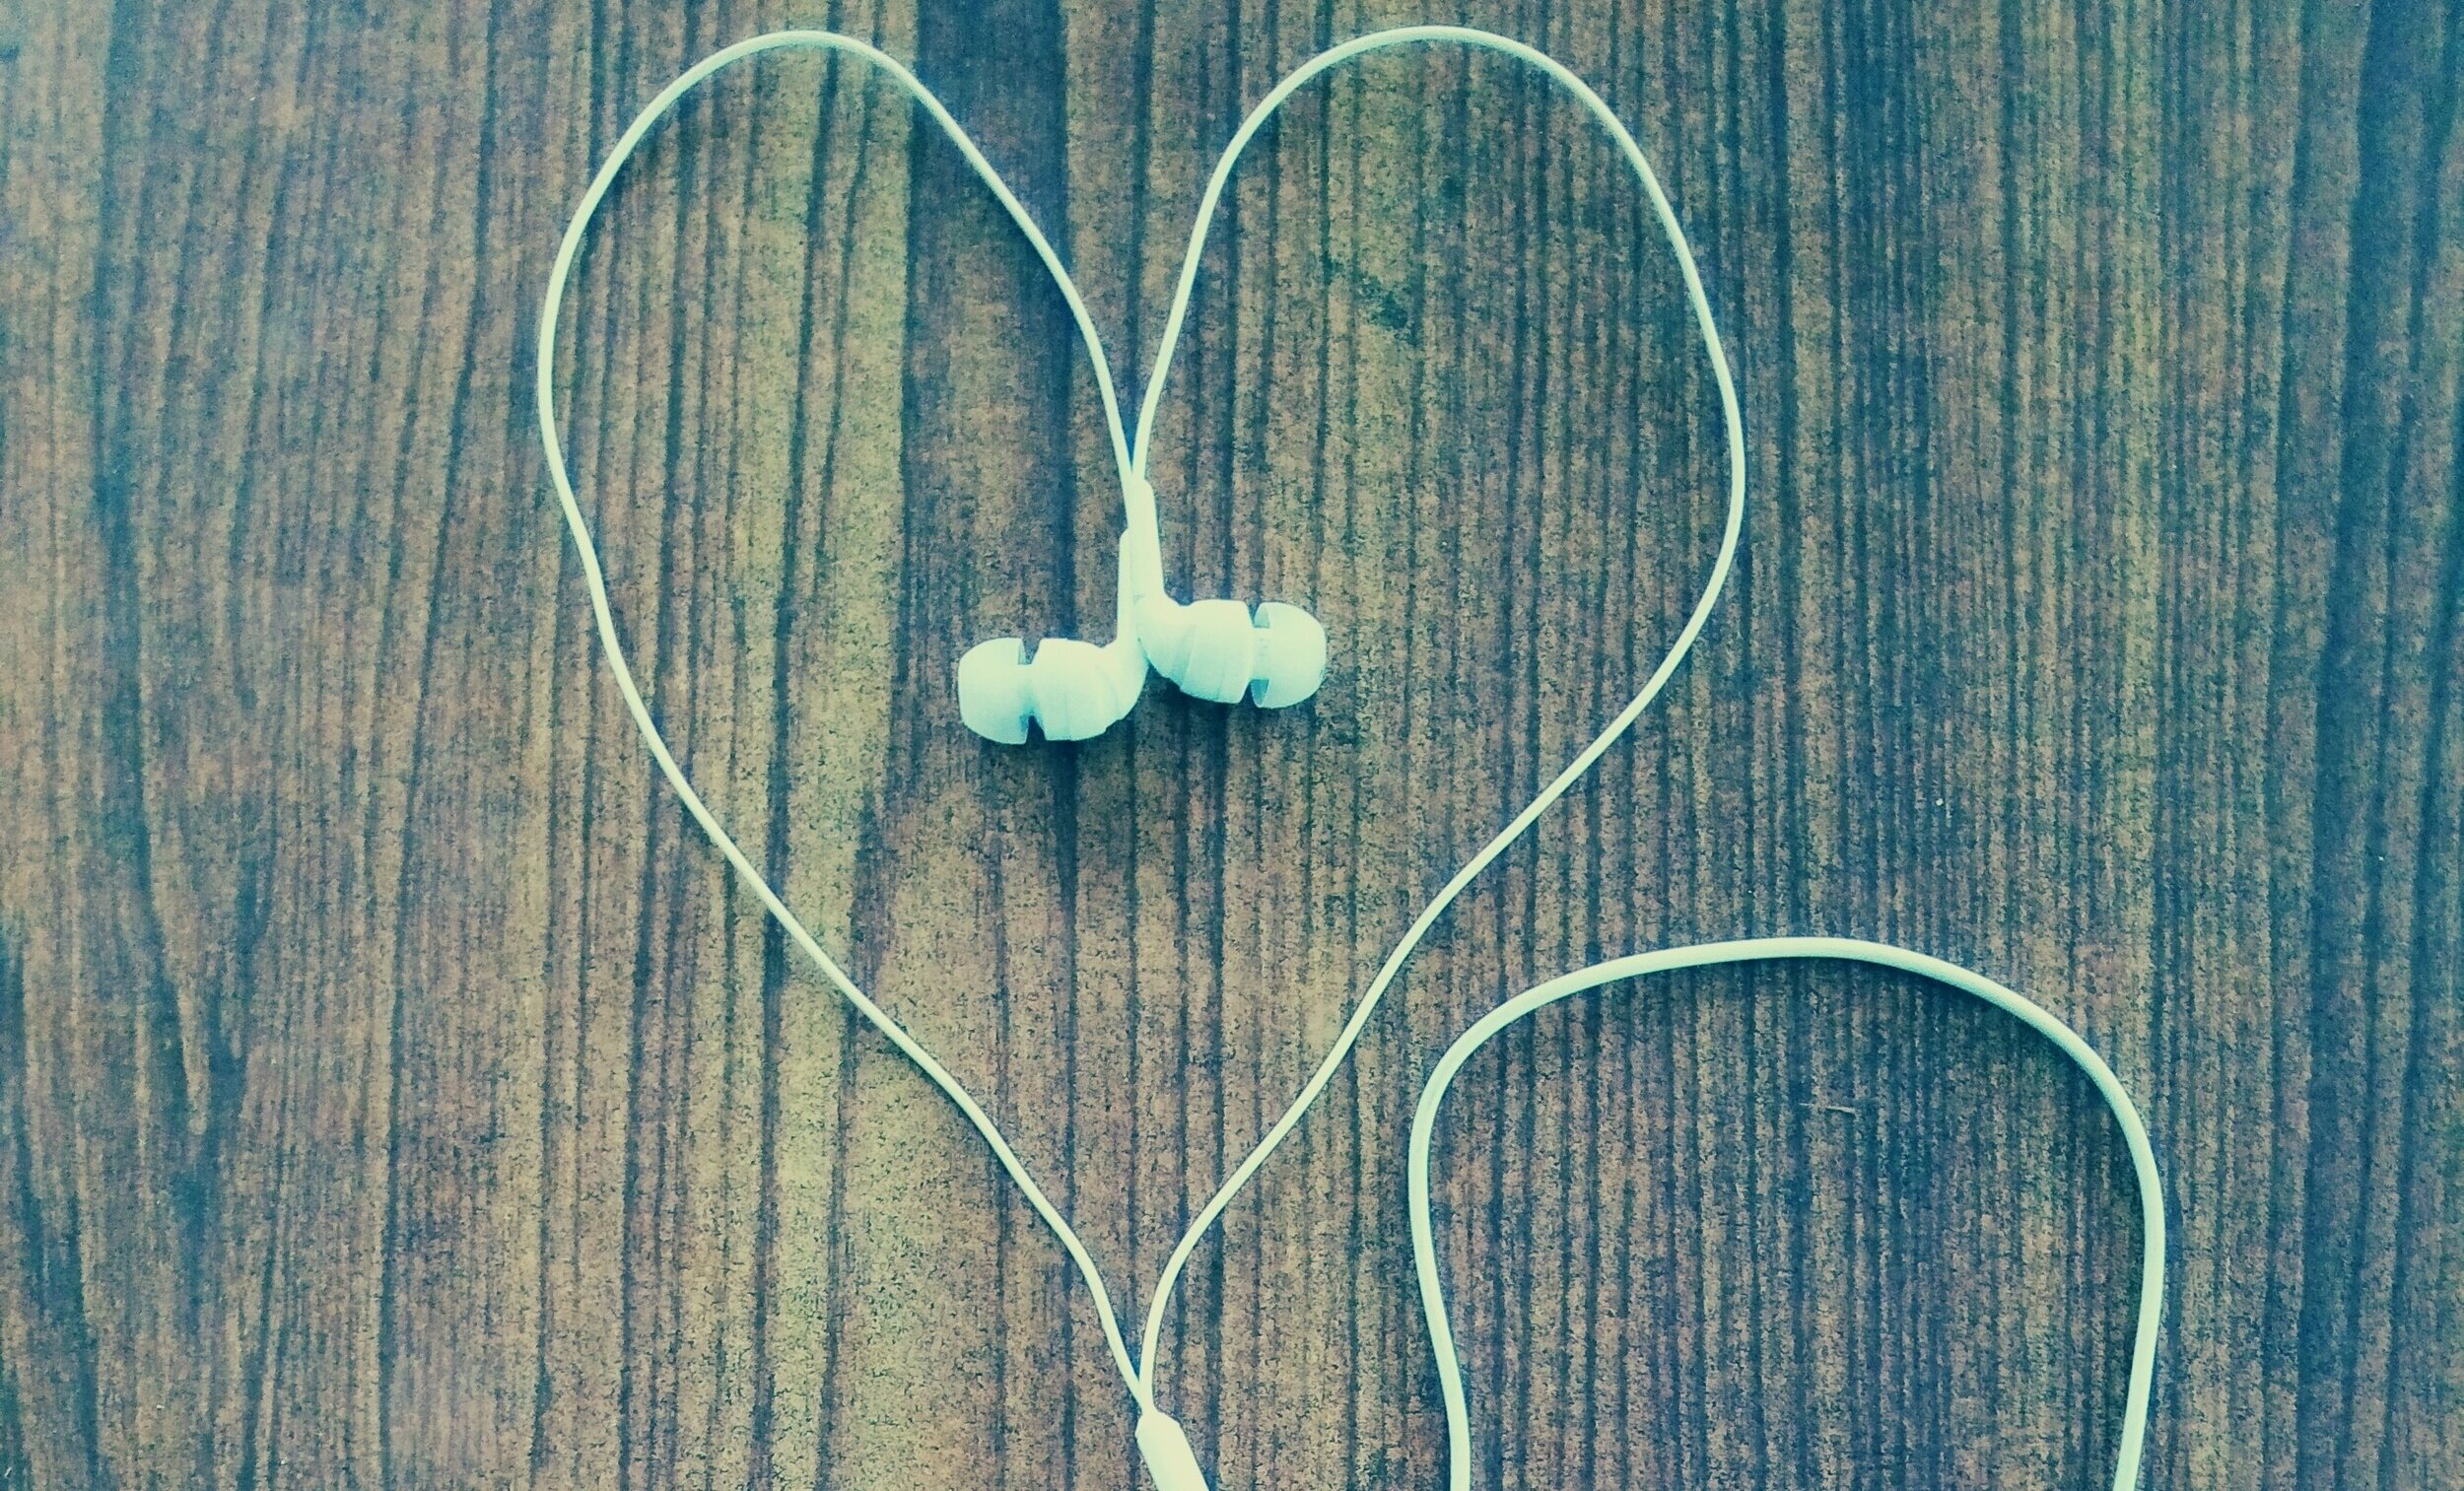 heart_headphones.jpg